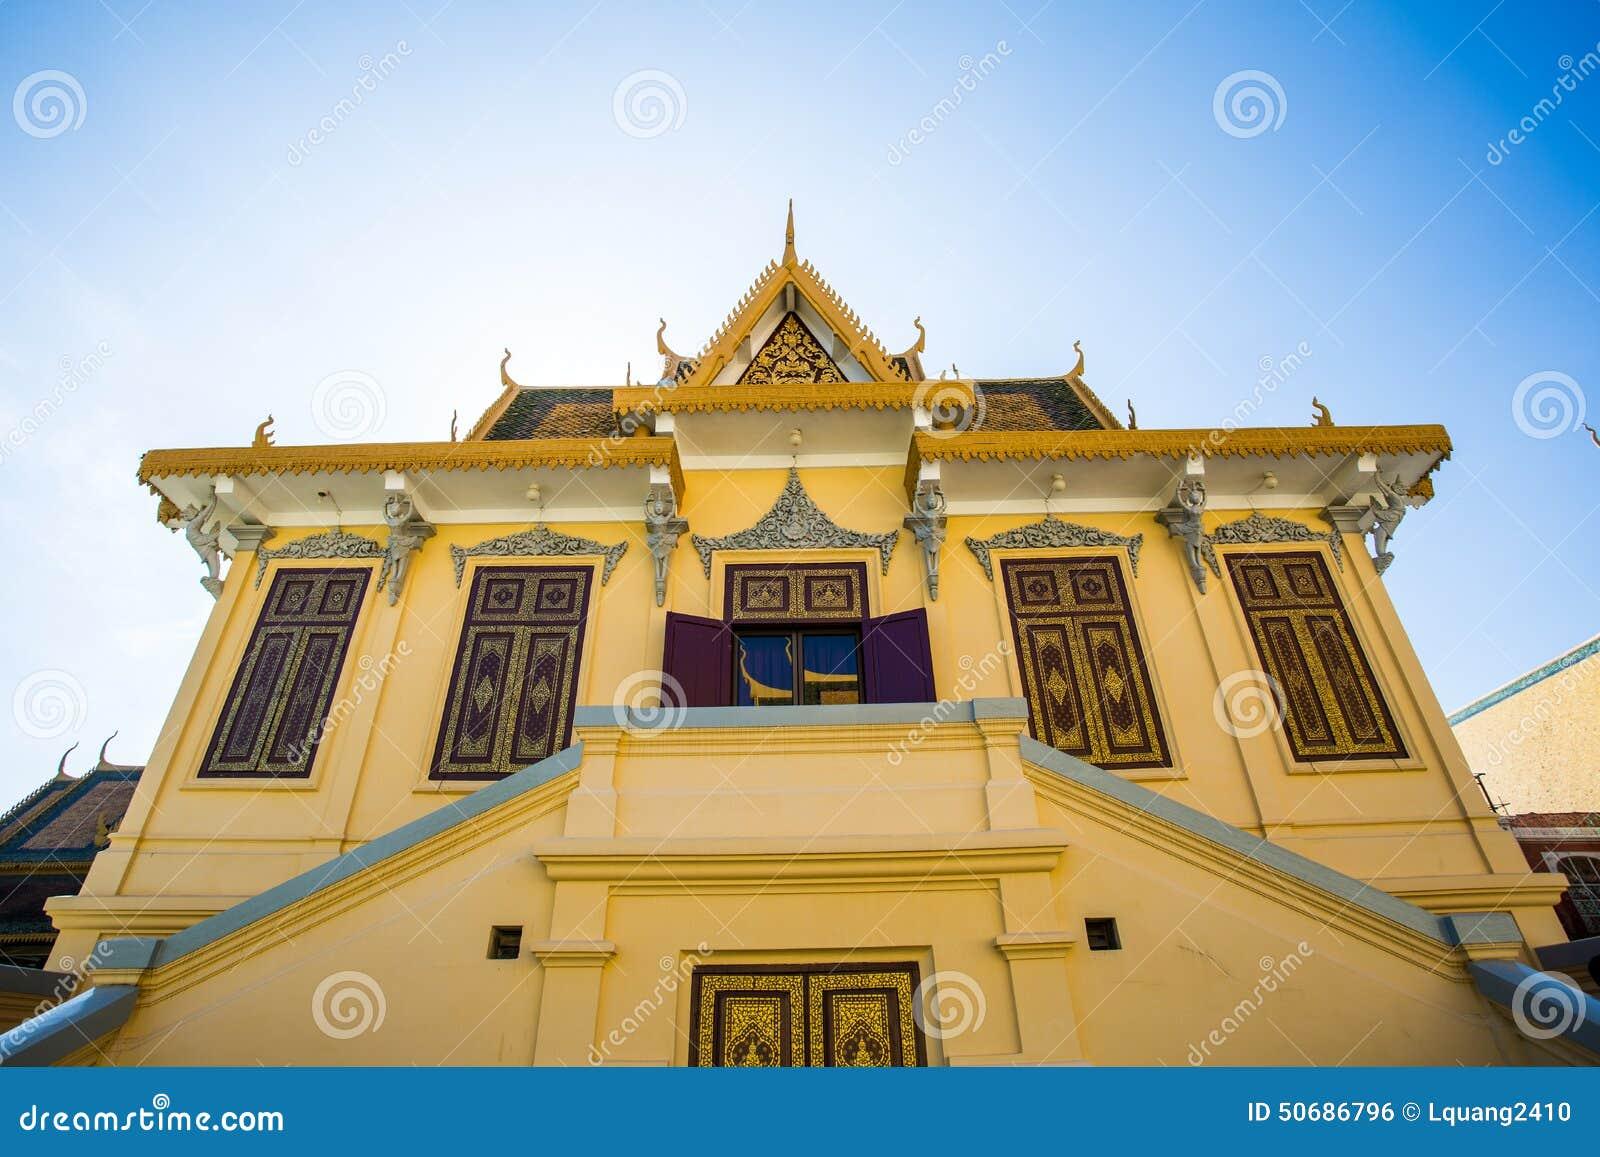 Download 皇家地方在金边 库存照片. 图片 包括有 布琼布拉, 豪华, 聚会所, 大厅, 修道院, 装饰, 发芽, 蓝色 - 50686796